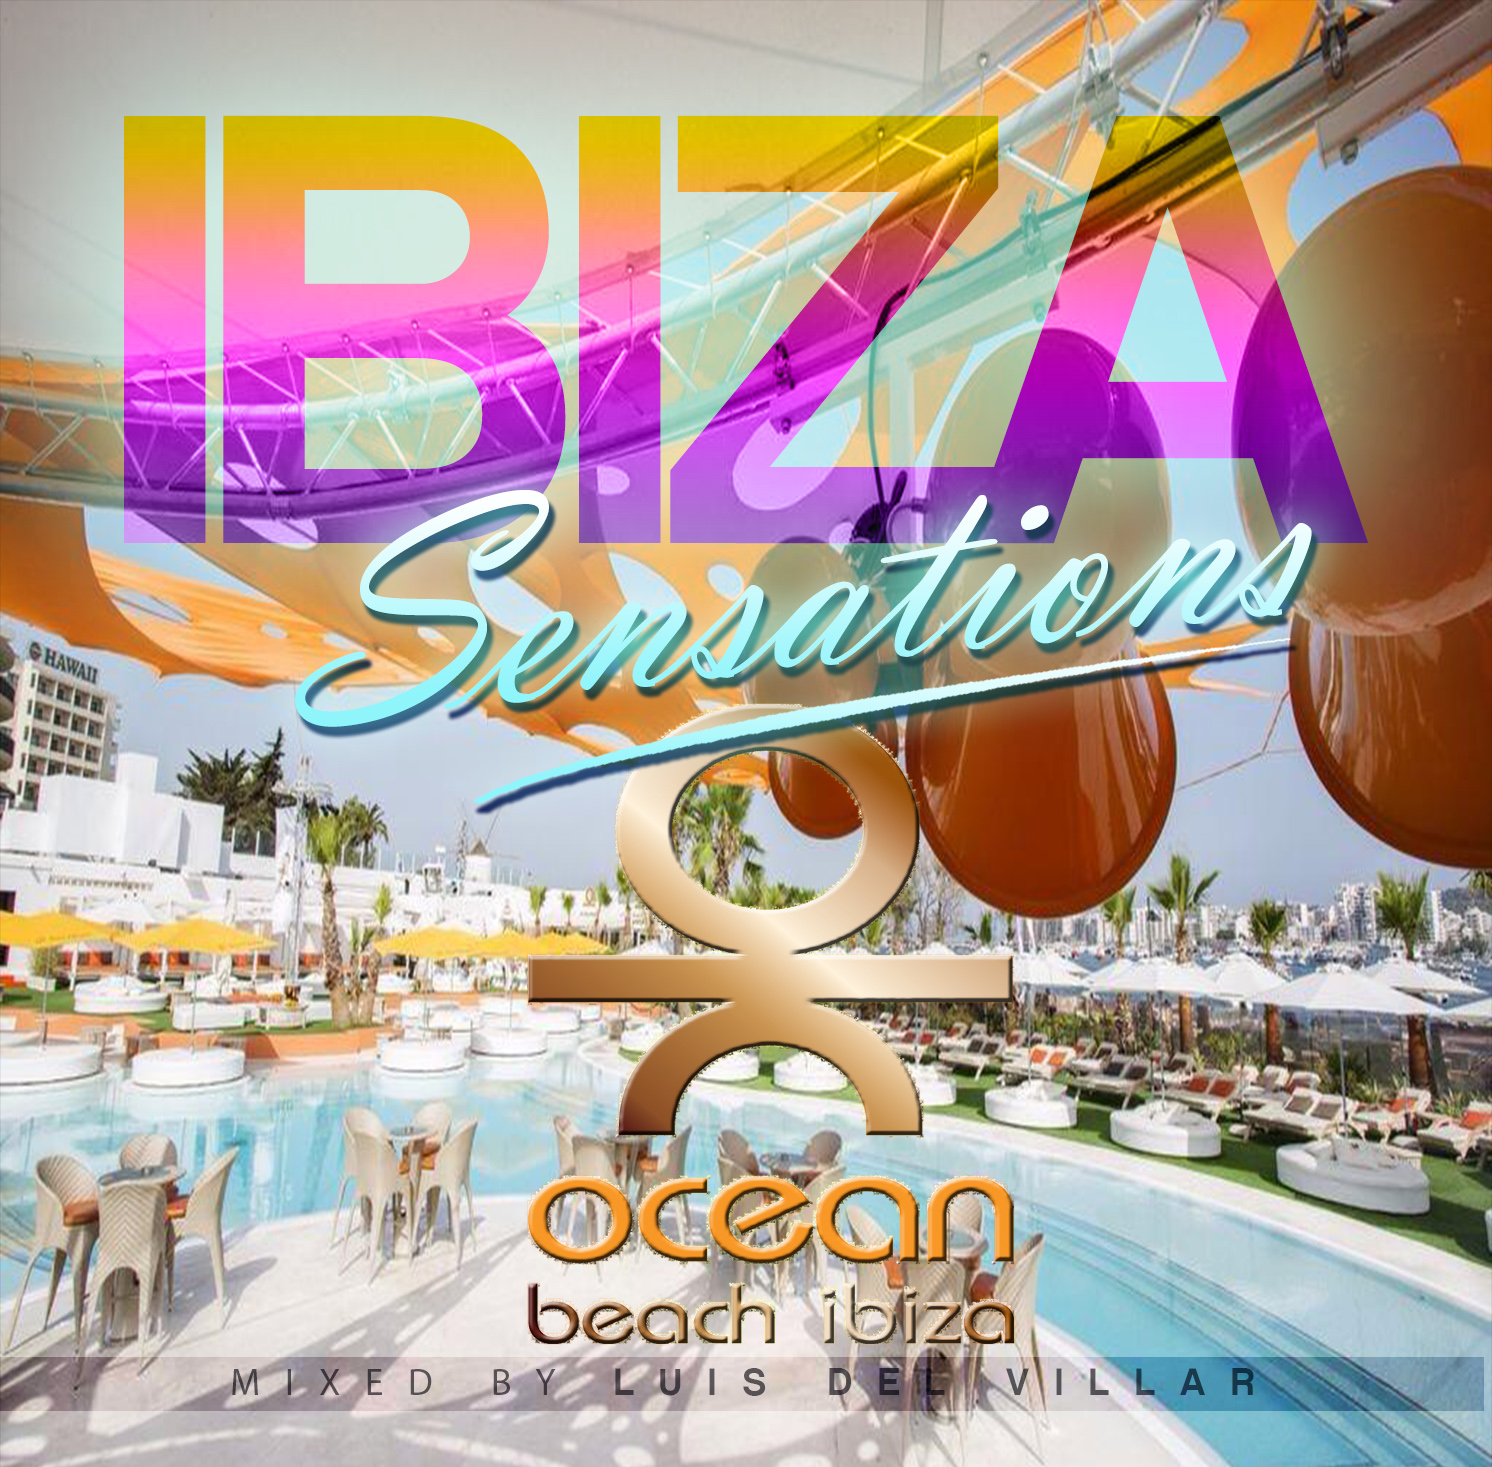 Artwork for Ibiza Sensations 68